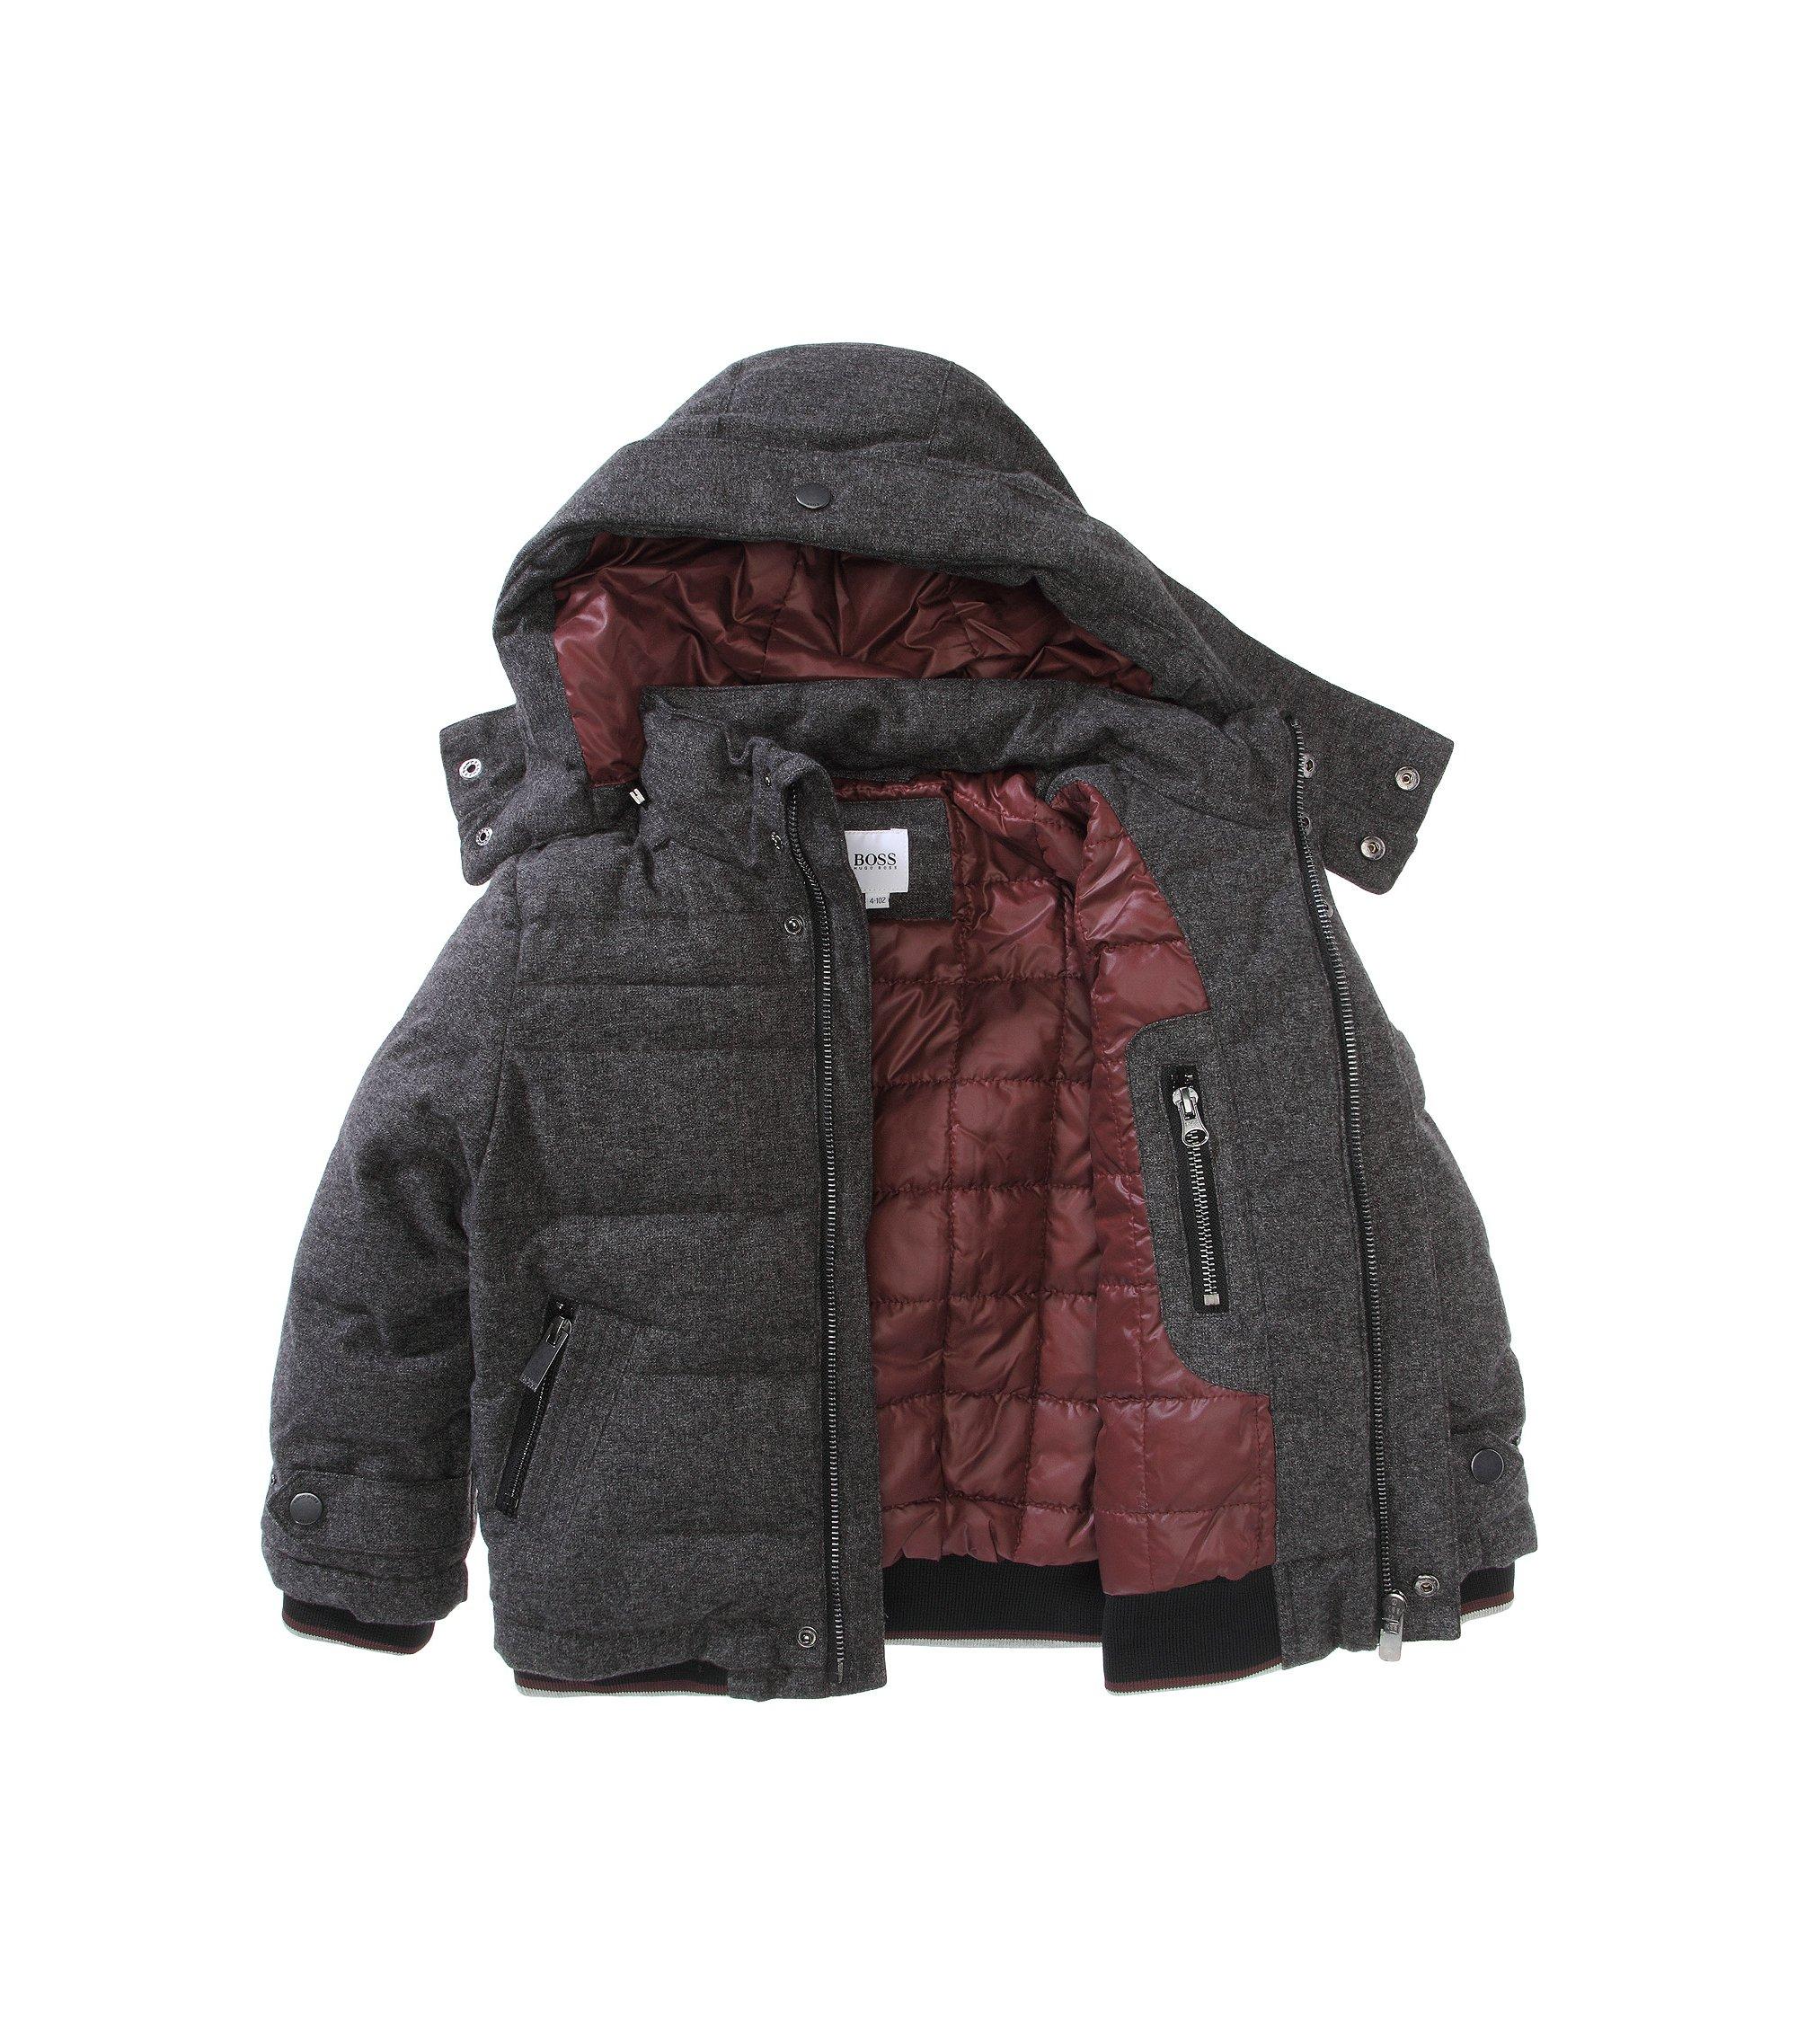 Kids Outdoor-Jacke mit Kapuze ´J26171/A80`, Anthrazit